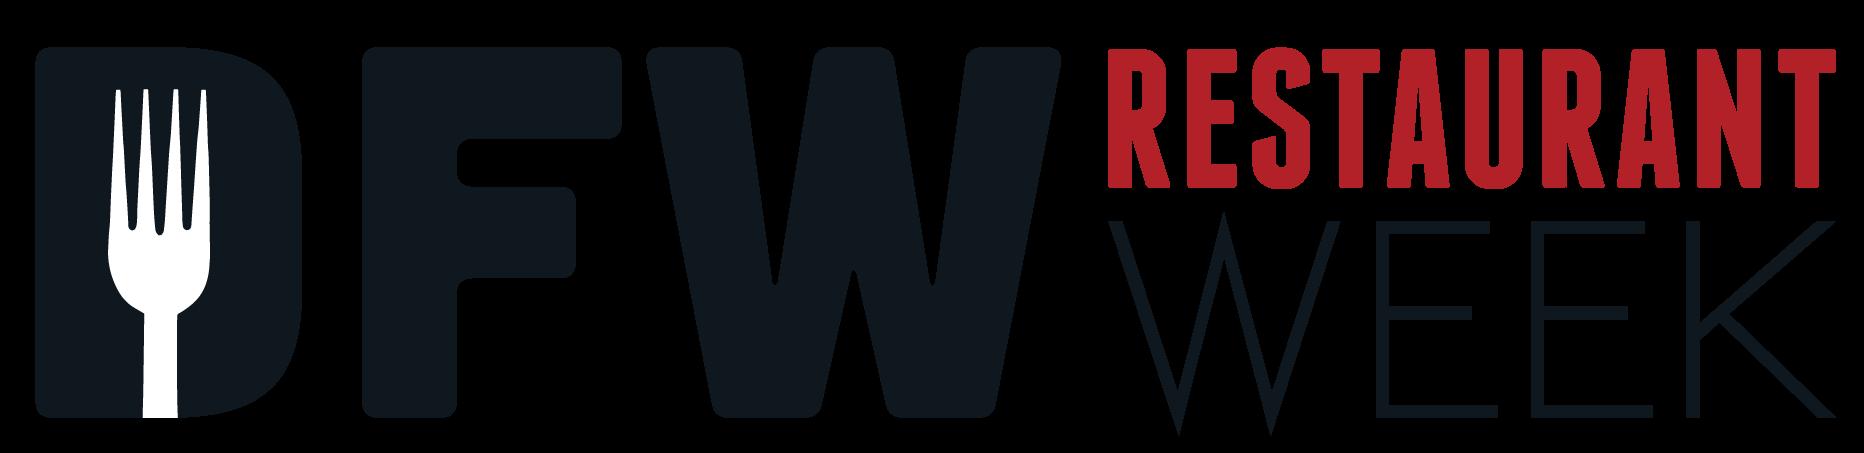 Dfw Restaurant Week 2018 August 13 September 3rd Id